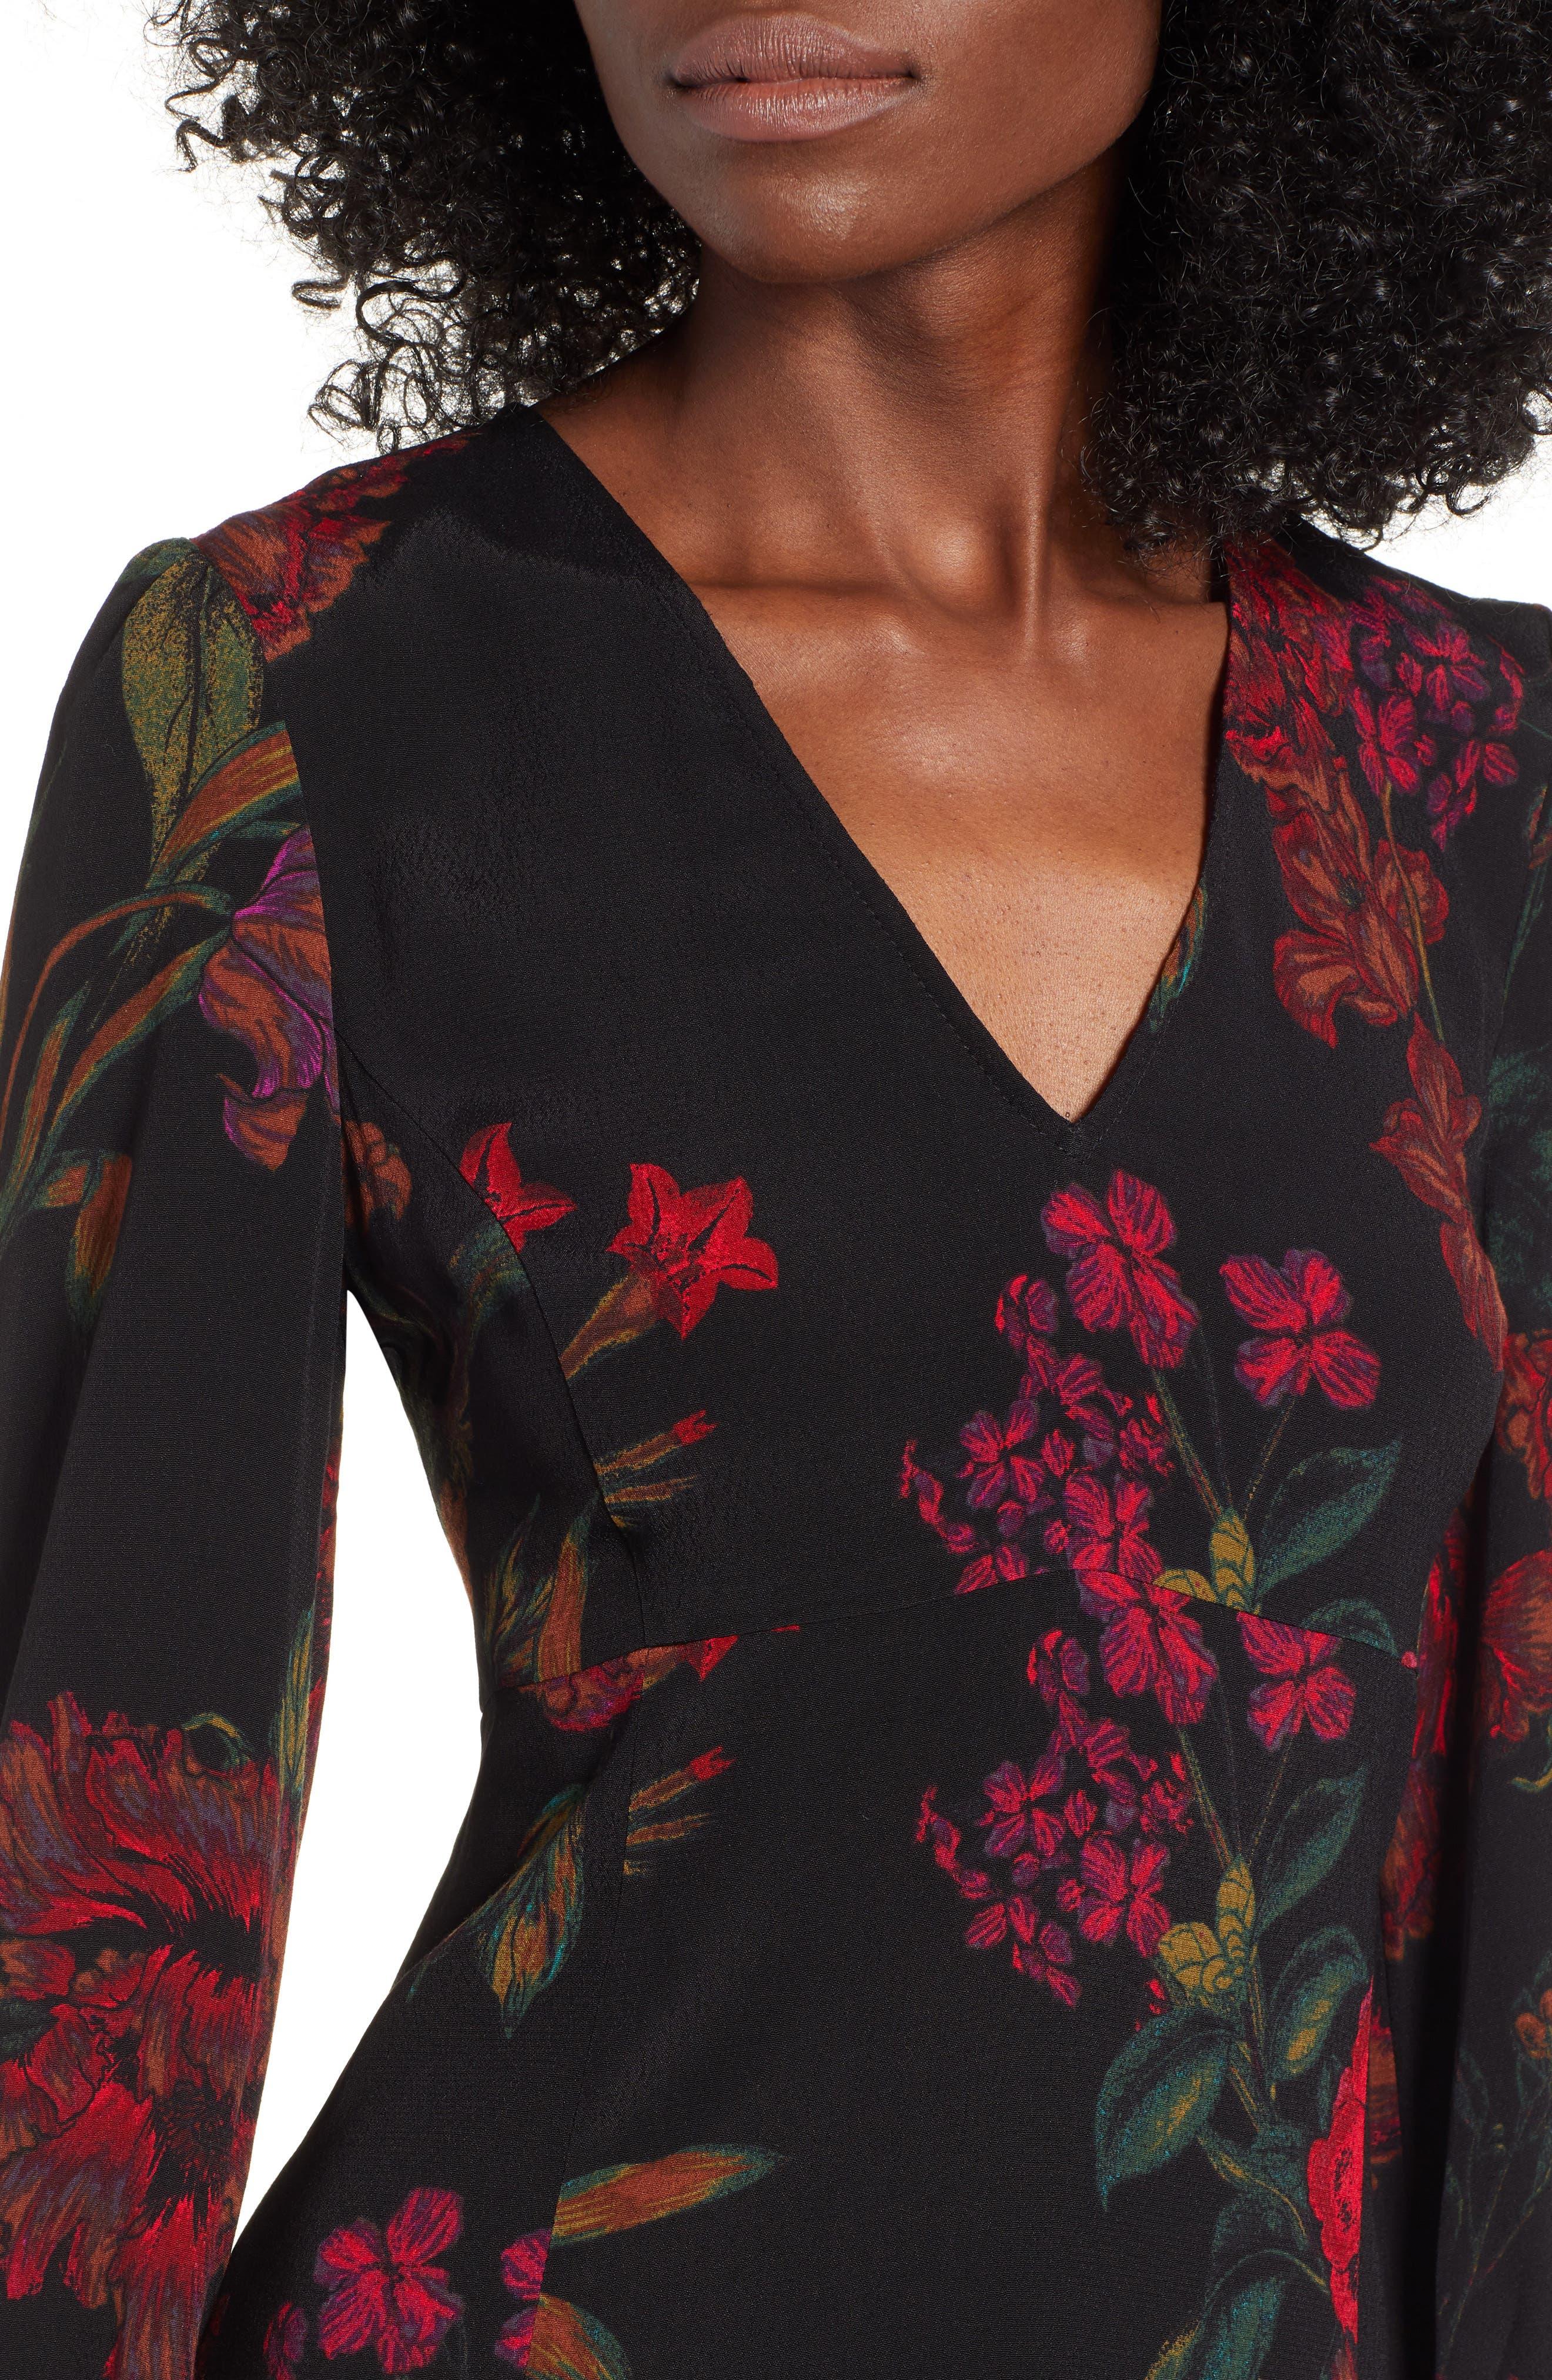 V-Neck Floral Print Minidress,                             Alternate thumbnail 4, color,                             BLACK STATEMENT FLORAL